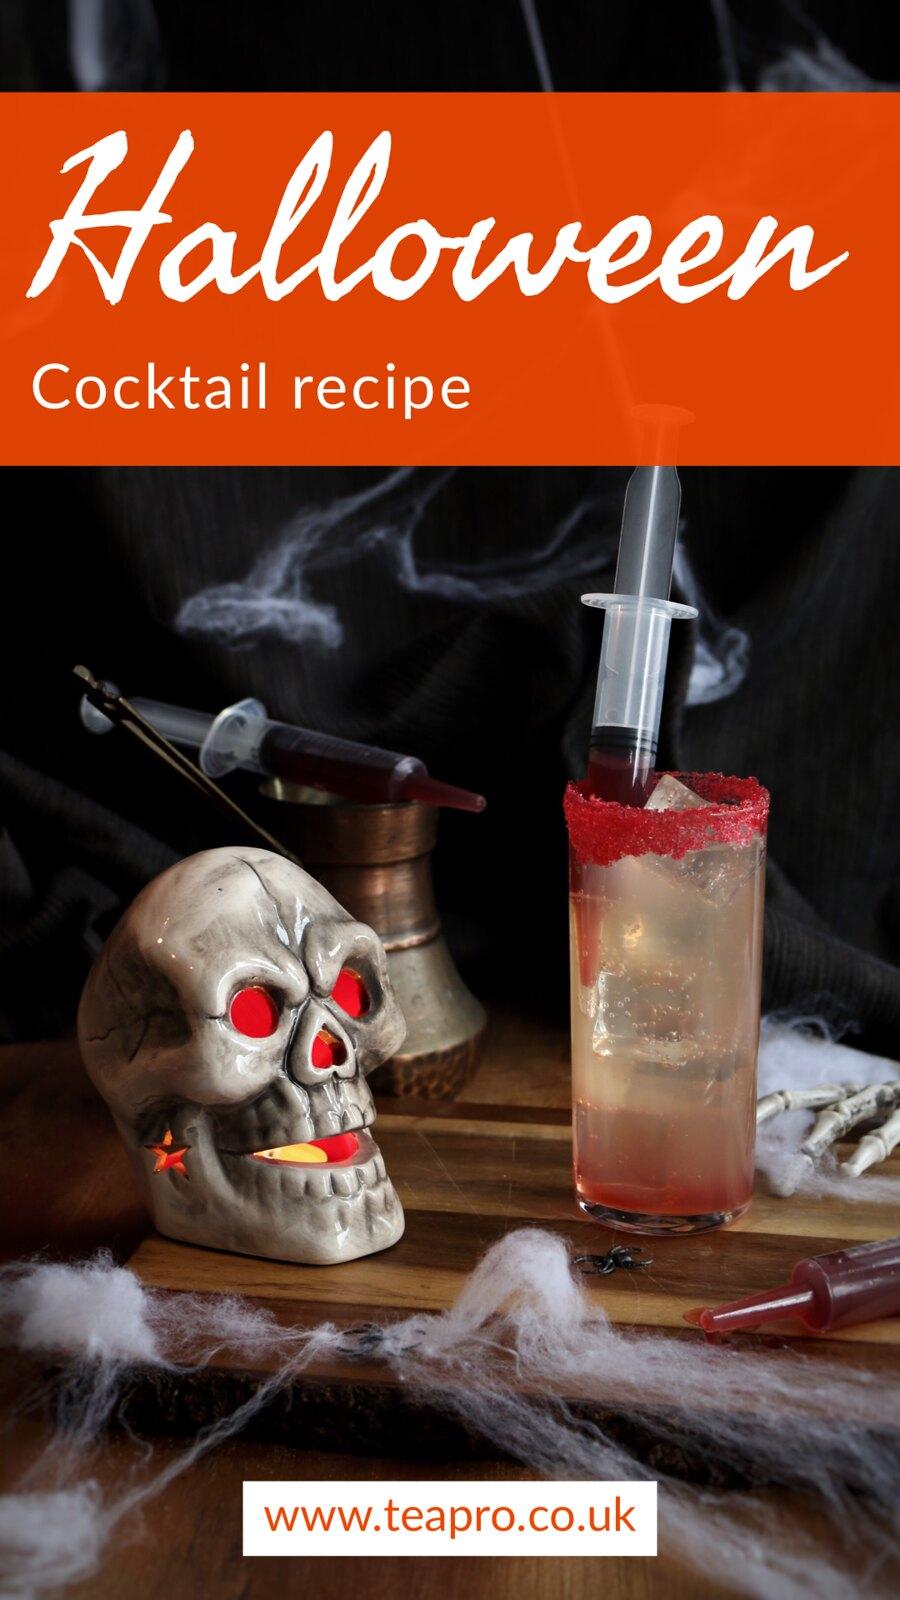 teapro spooky Halloween cocktail recipe